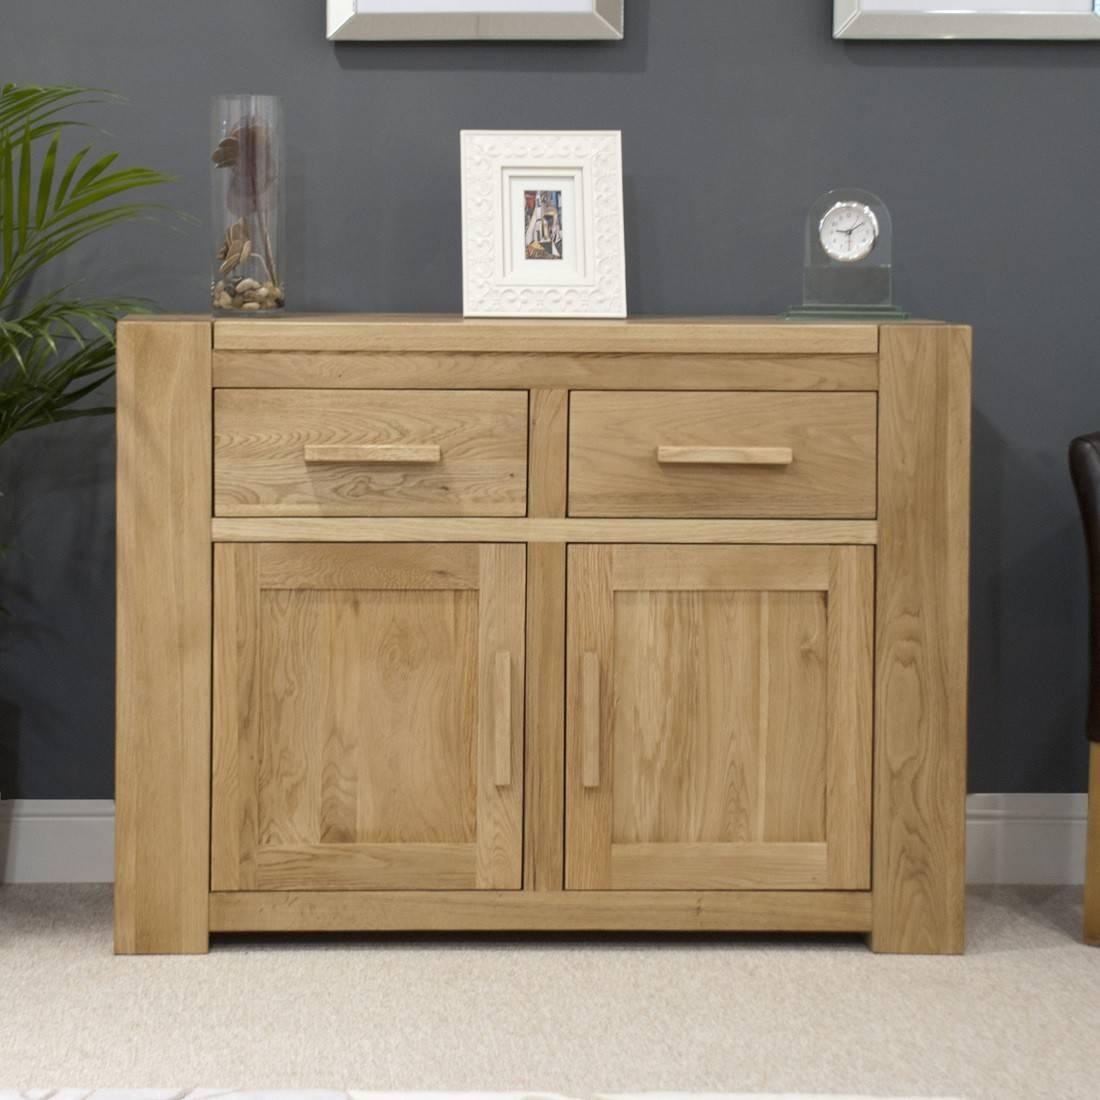 Solid Oak Furniture   Oak Furniture Uk Pertaining To Light Oak Sideboards (View 15 of 20)